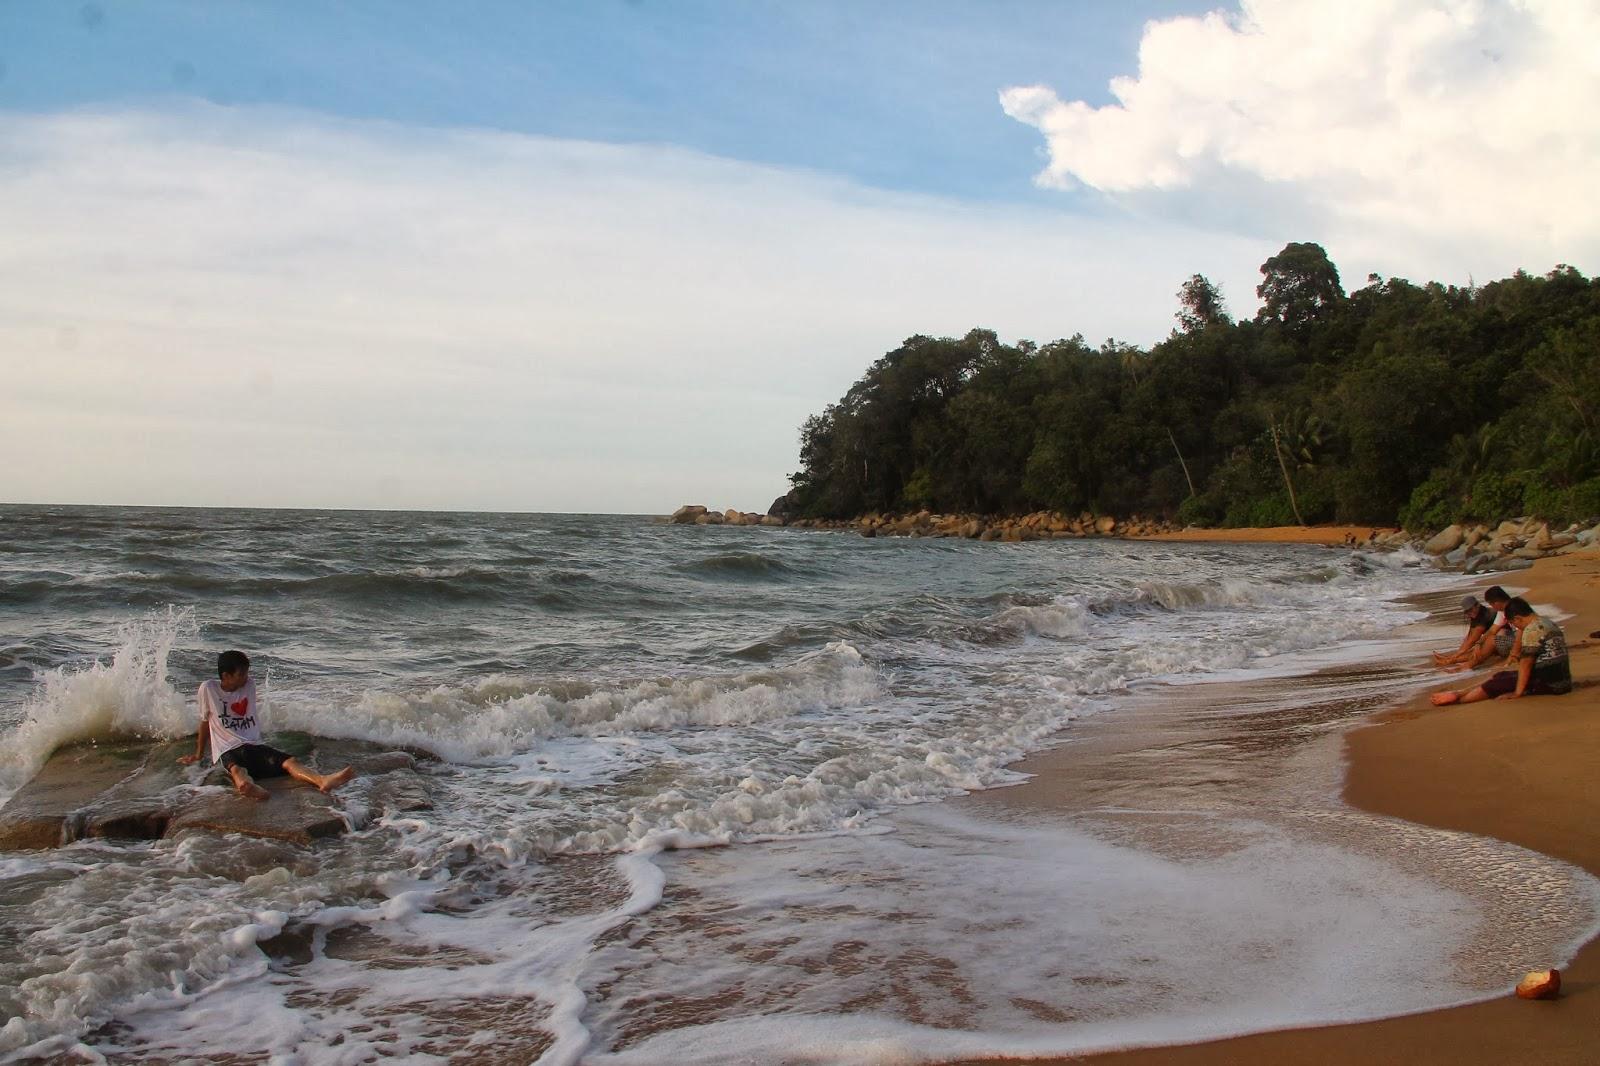 Landscape Berulangkali Pergi Pantai Kura Singkawang Tepatnya Mungkin Sekitar 18